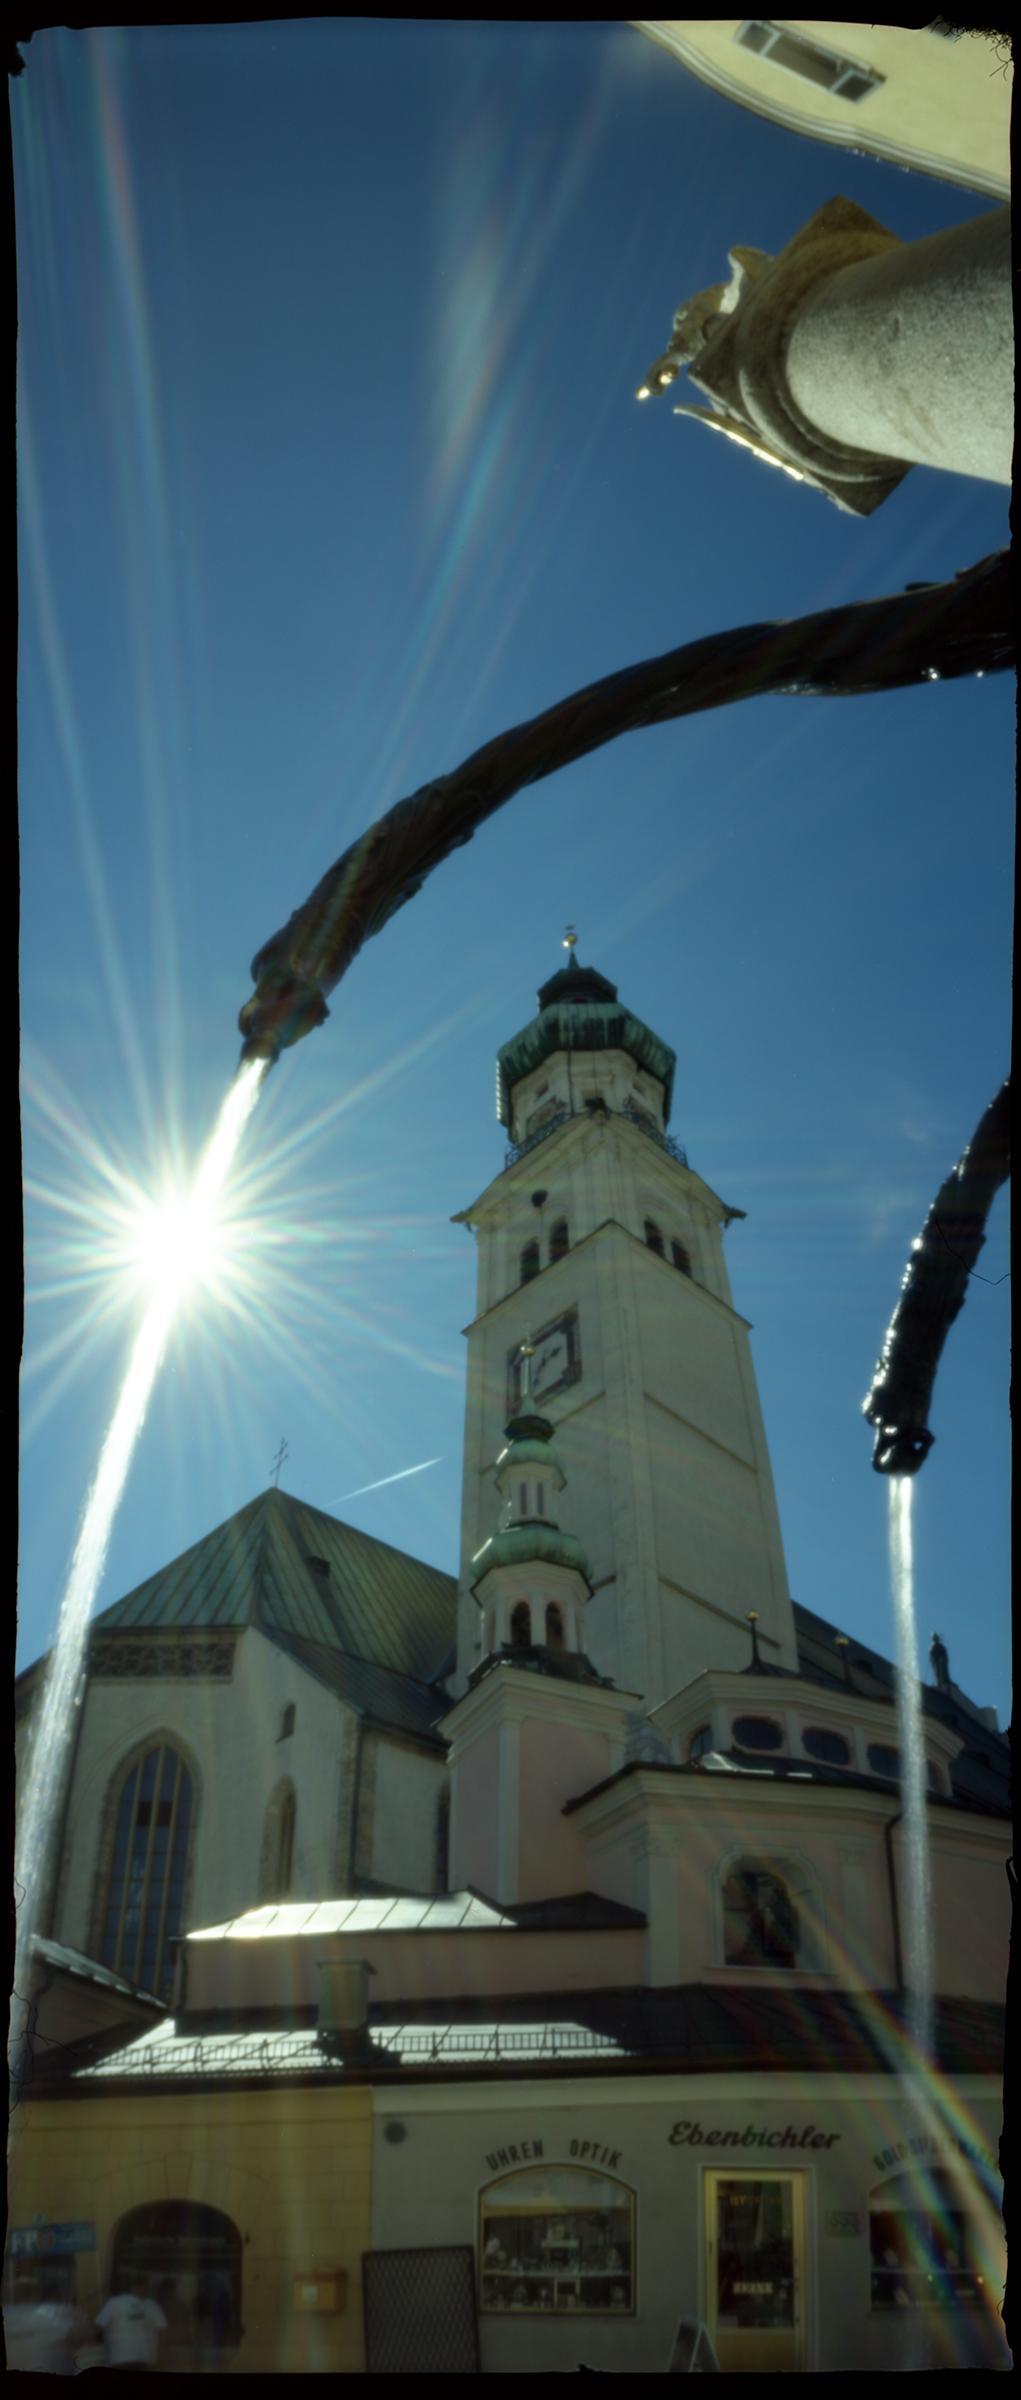 Sant Nikolaus parish church - Hall in Tirol, Austria - Kodak Ektar 100 ASA in a Wheehamx panoramic curved plane 6x12 pinhole camera